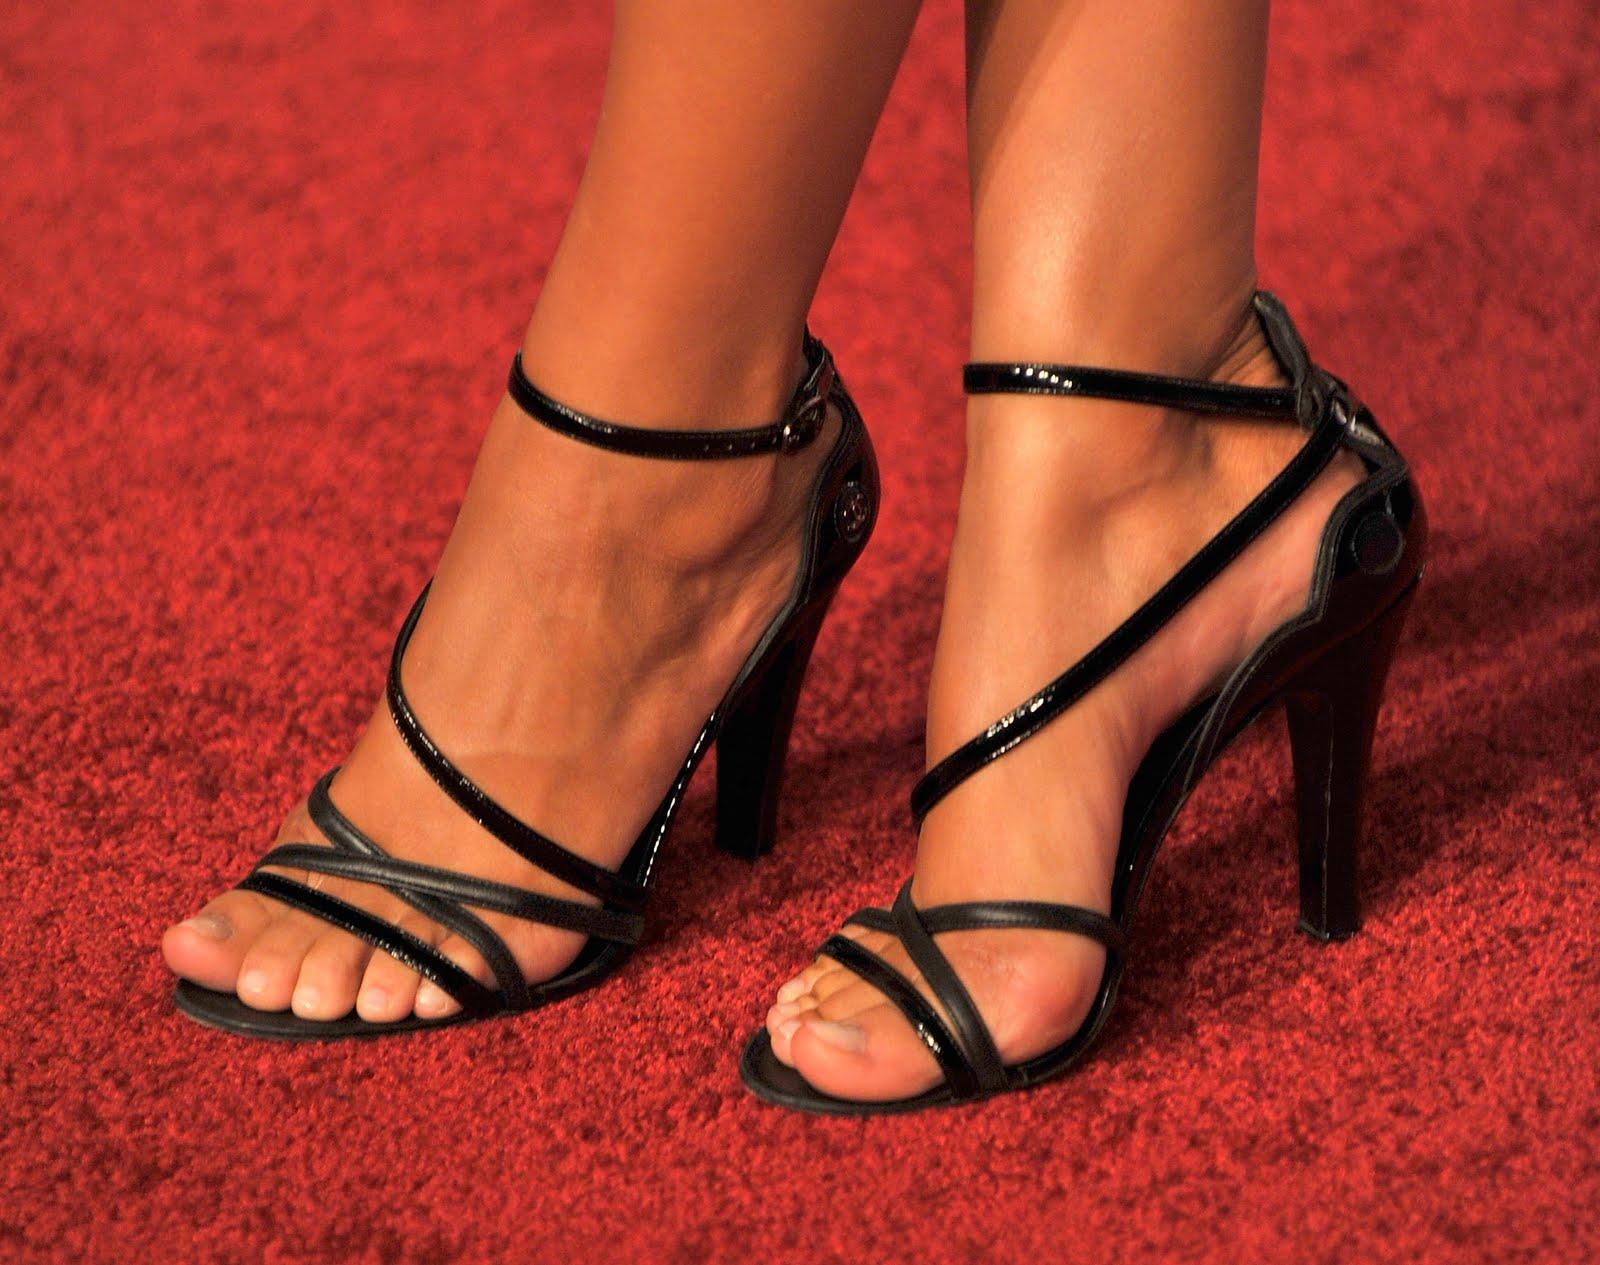 http://1.bp.blogspot.com/_lKe2XK1kSnY/TBQ0K2KnrRI/AAAAAAAAB4w/i7W55rlig-A/s1600/camilla-belle-shoes.jpg